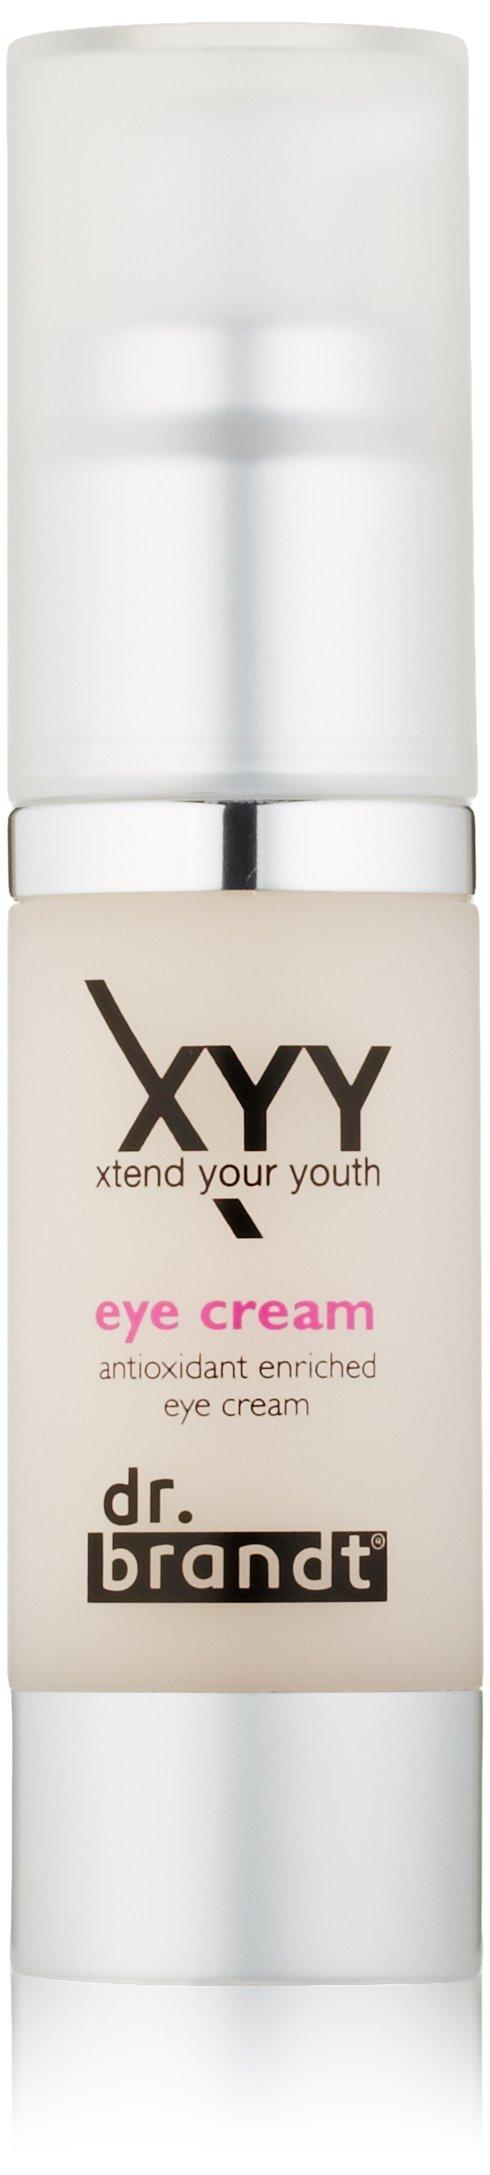 dr. brandt Xtend Your Youth Eye Cream, 0.5 fl. oz.